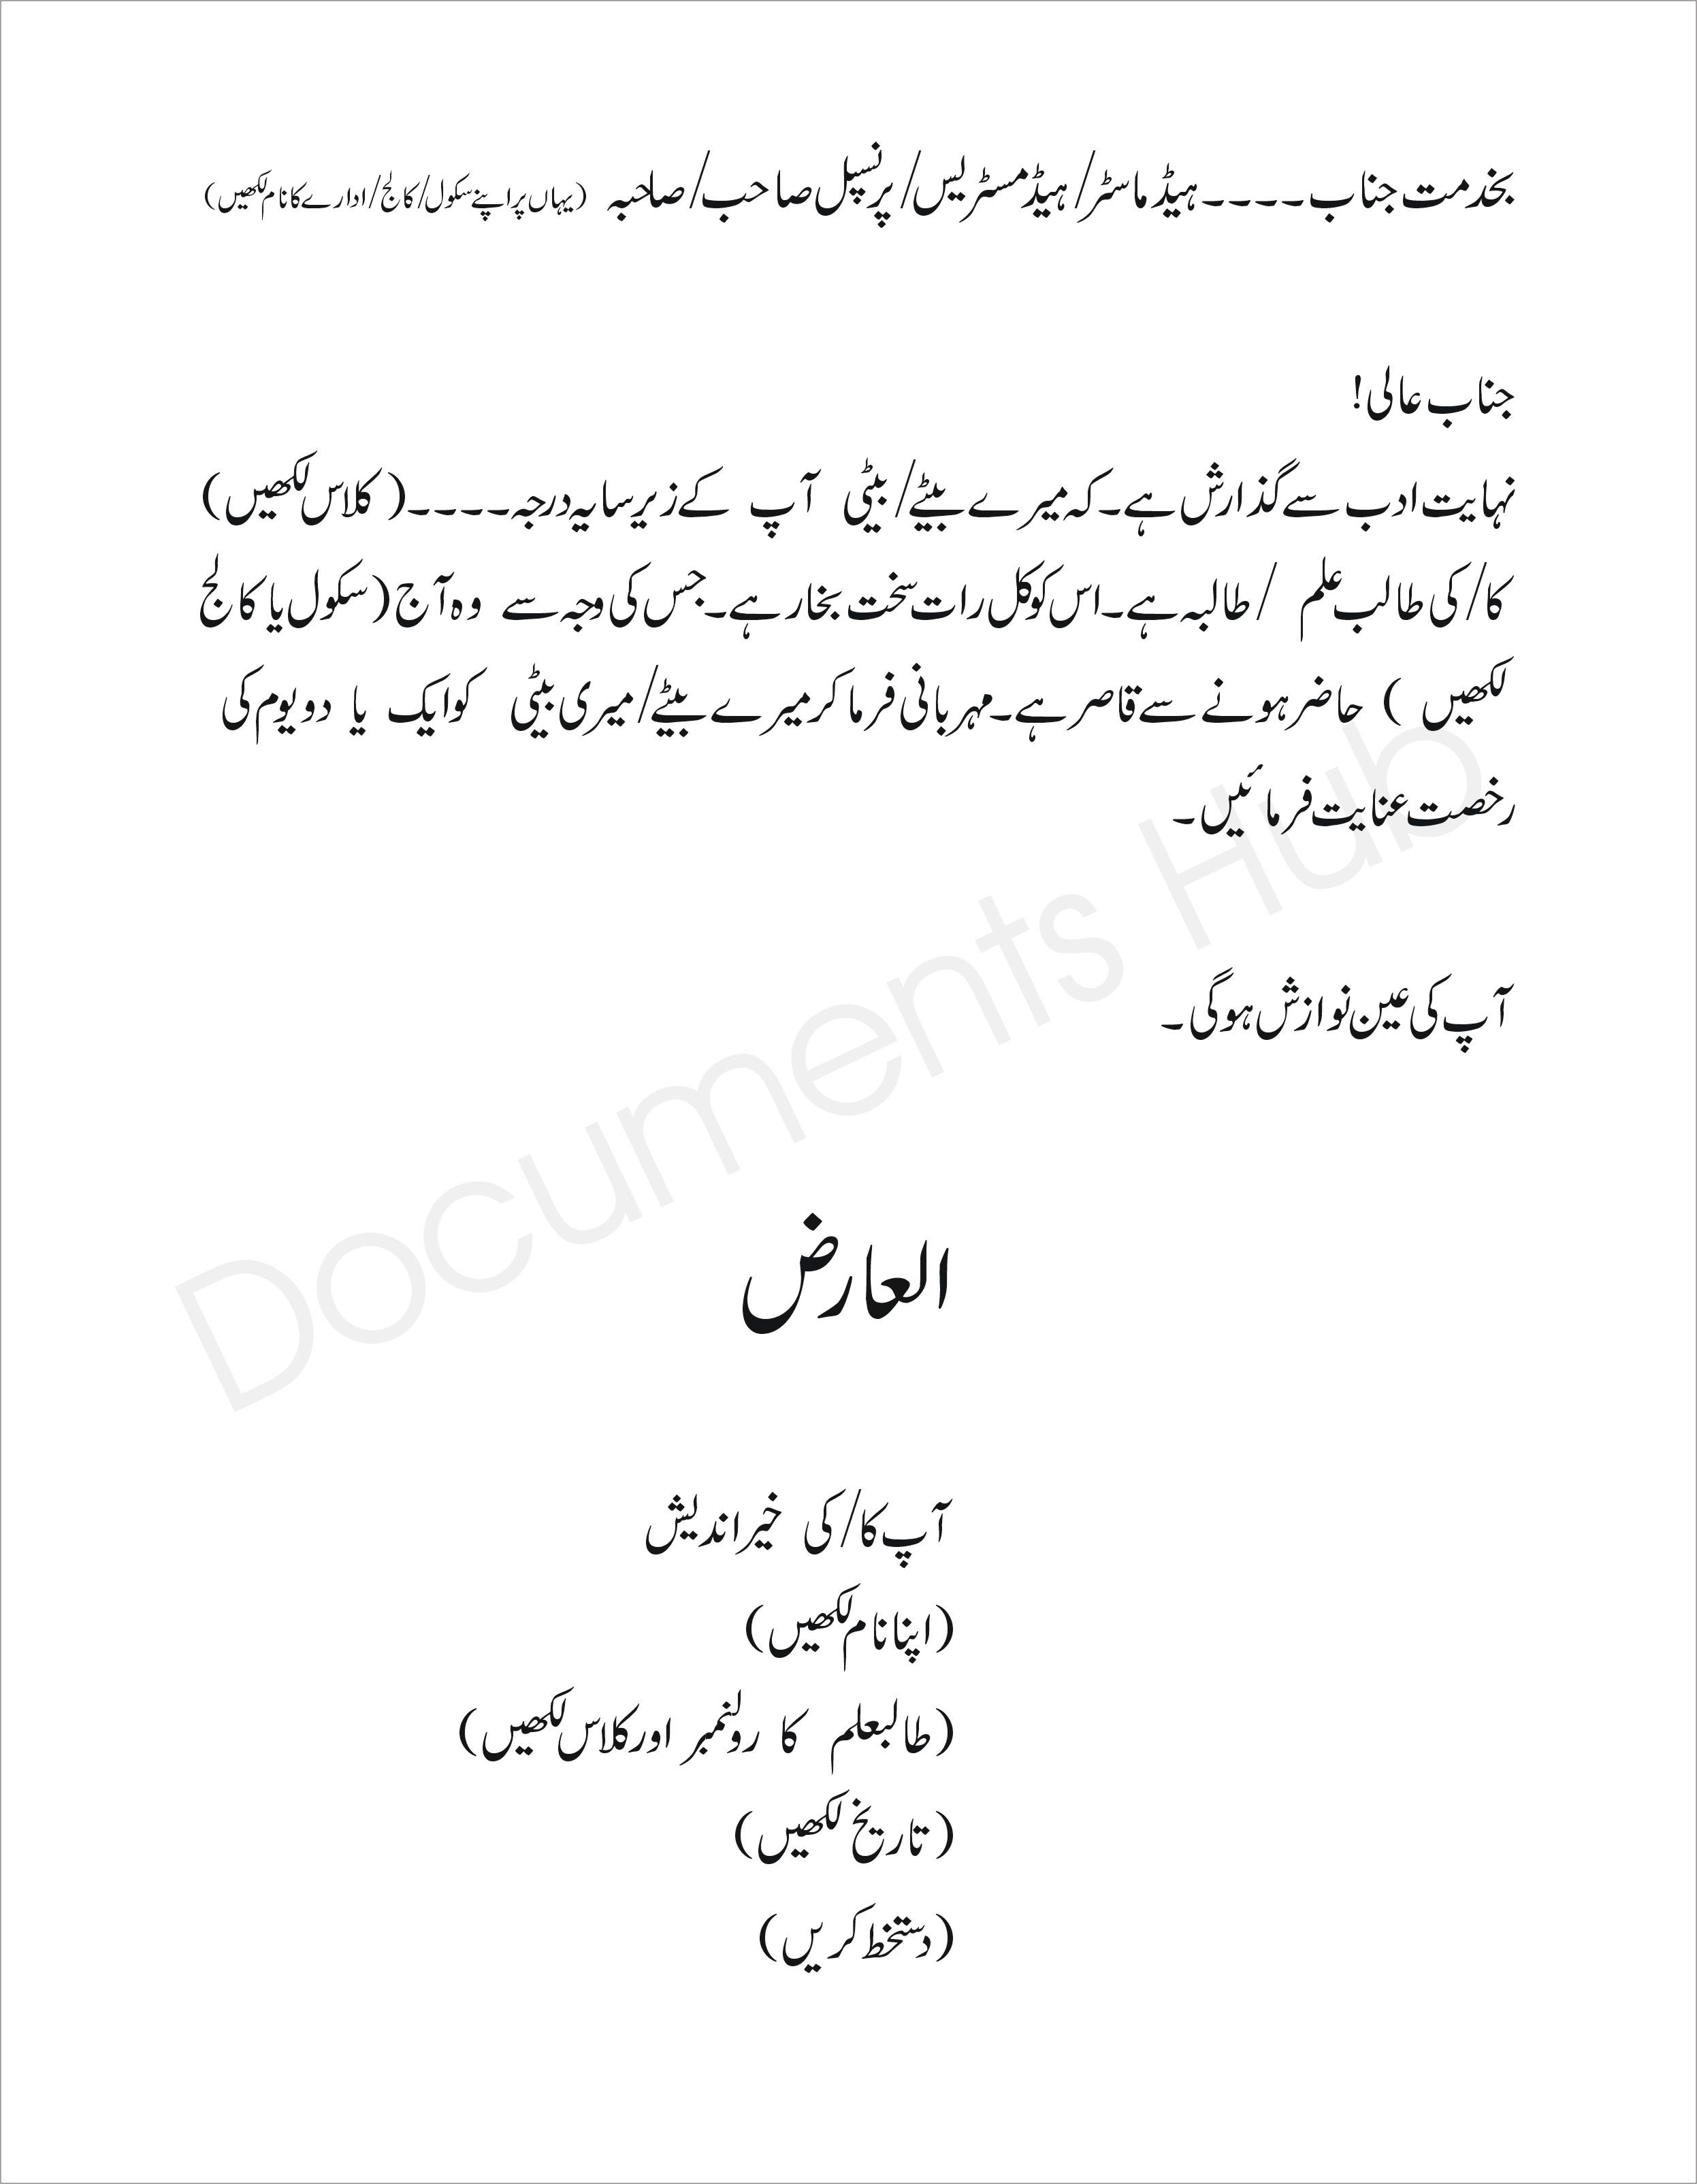 Application for sick leave in urdu documentshub application for sick leave from parent spiritdancerdesigns Images